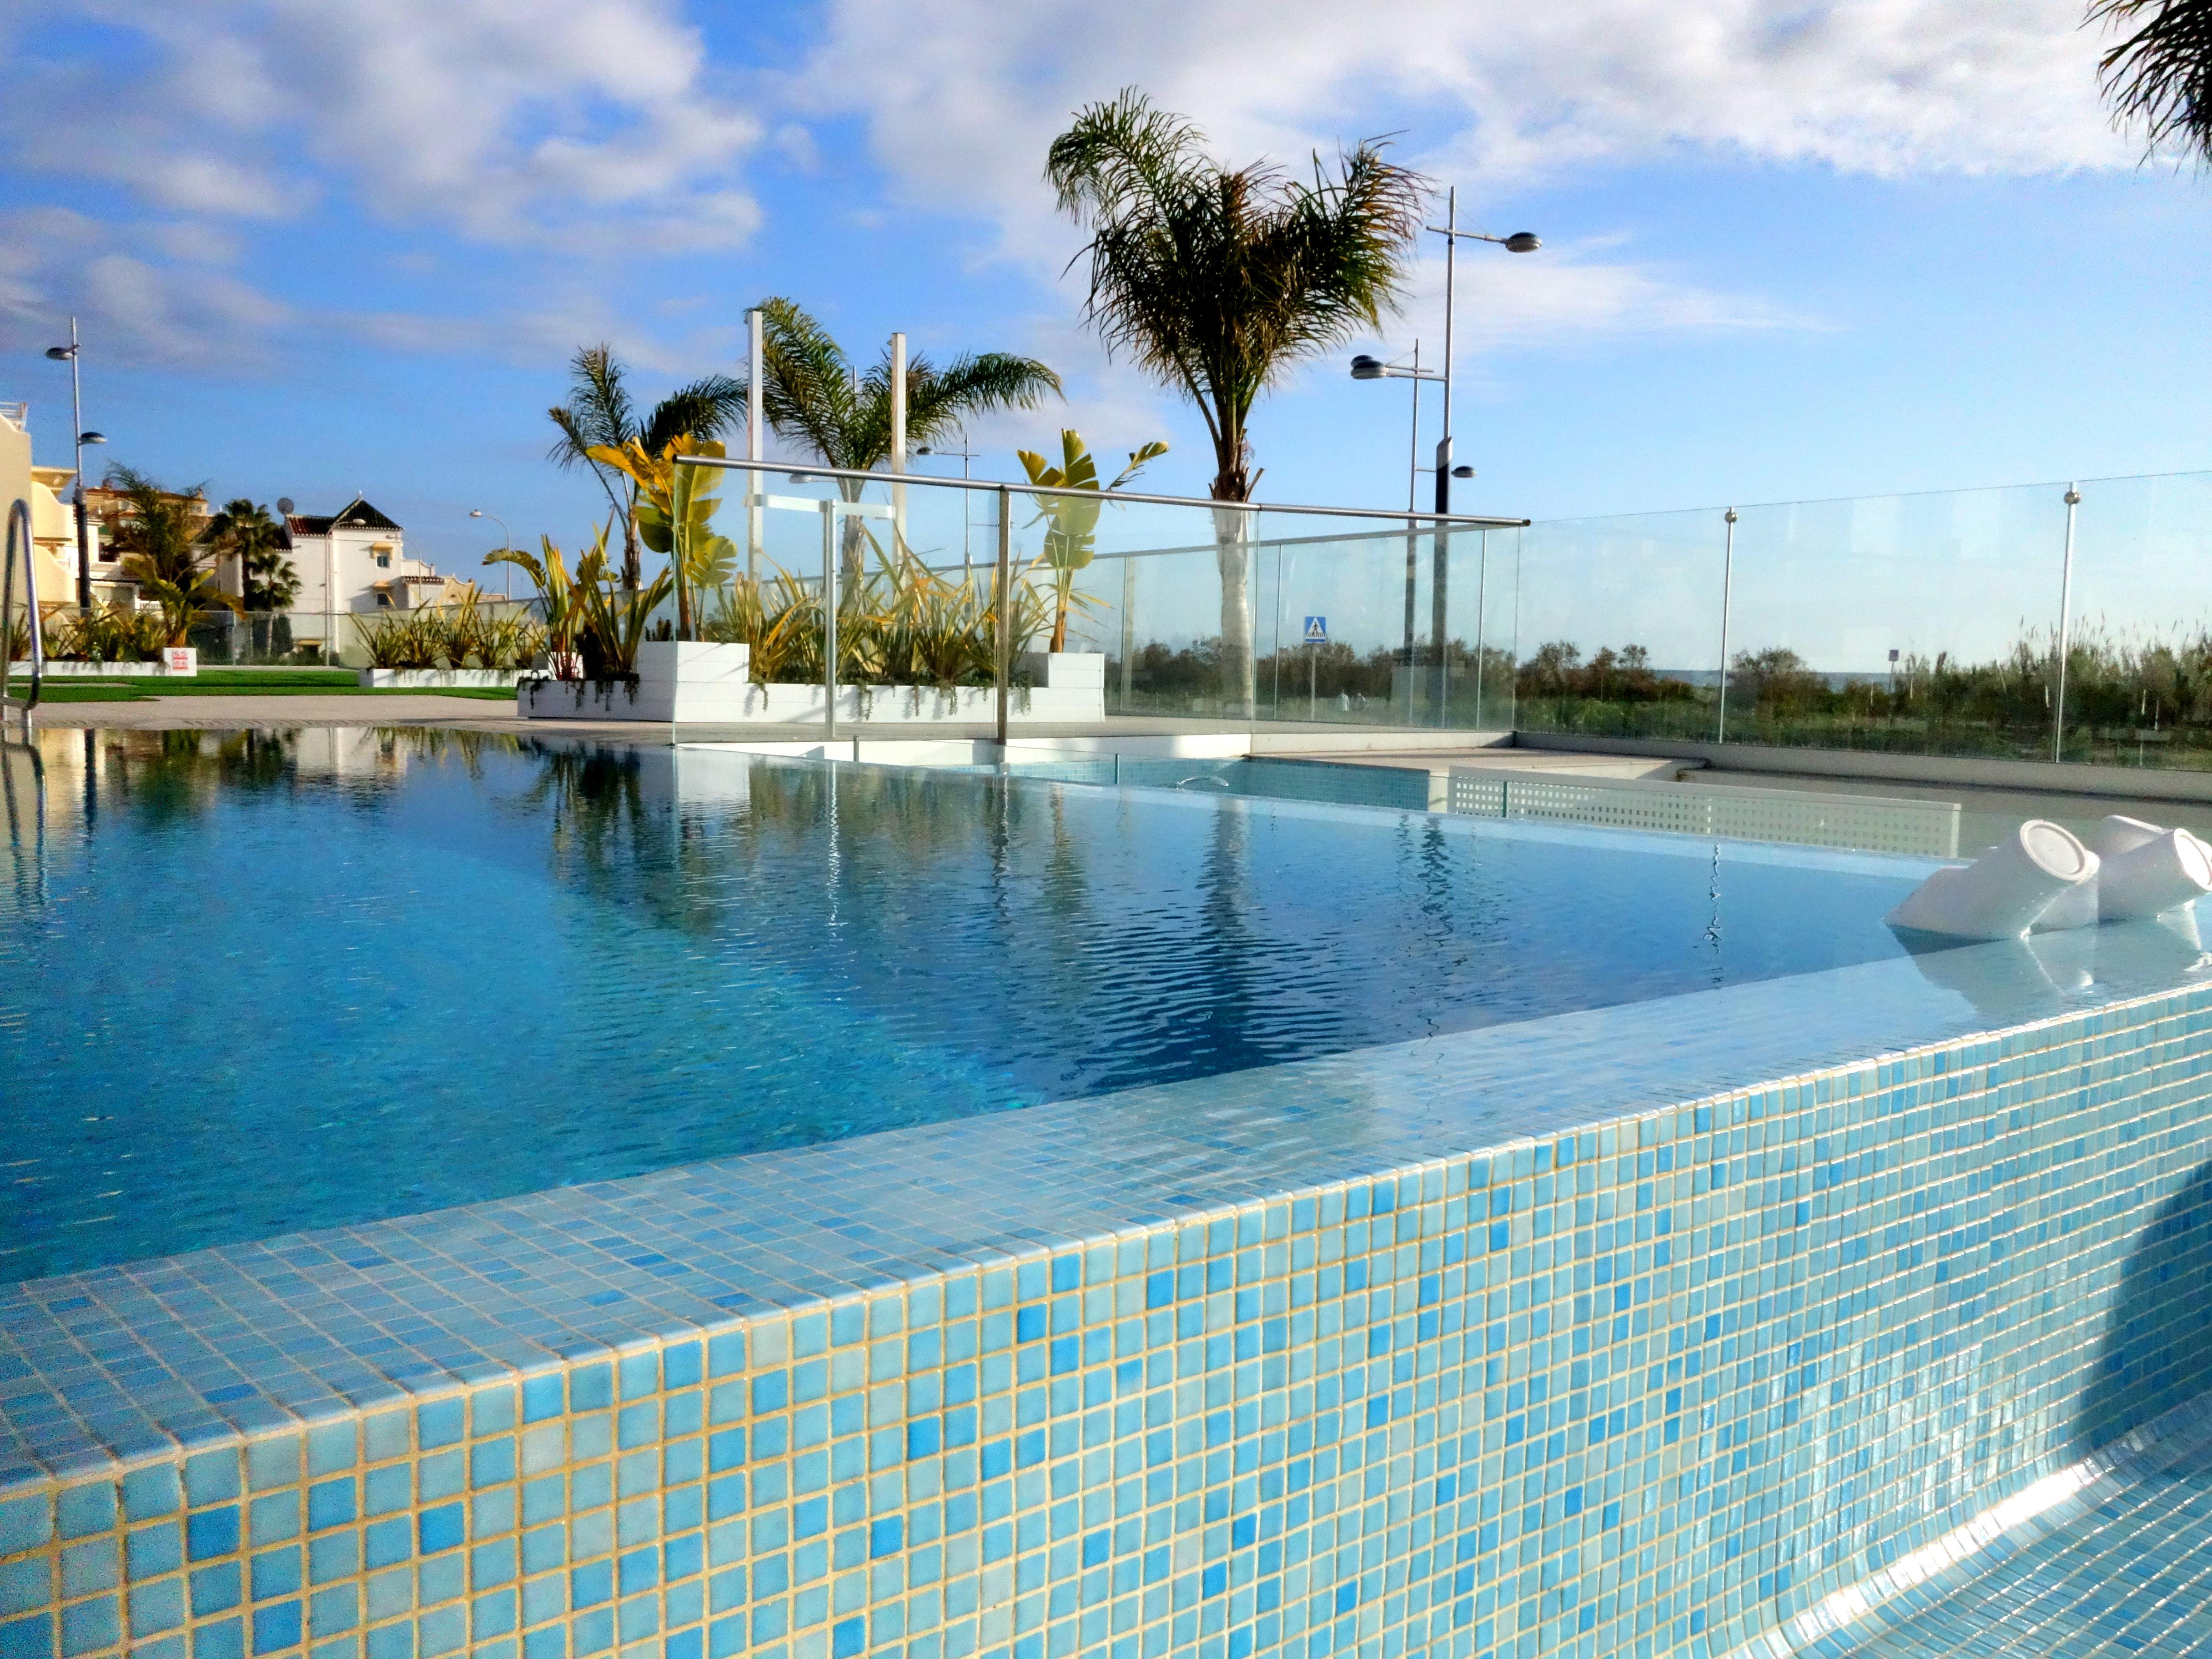 Eternety pool